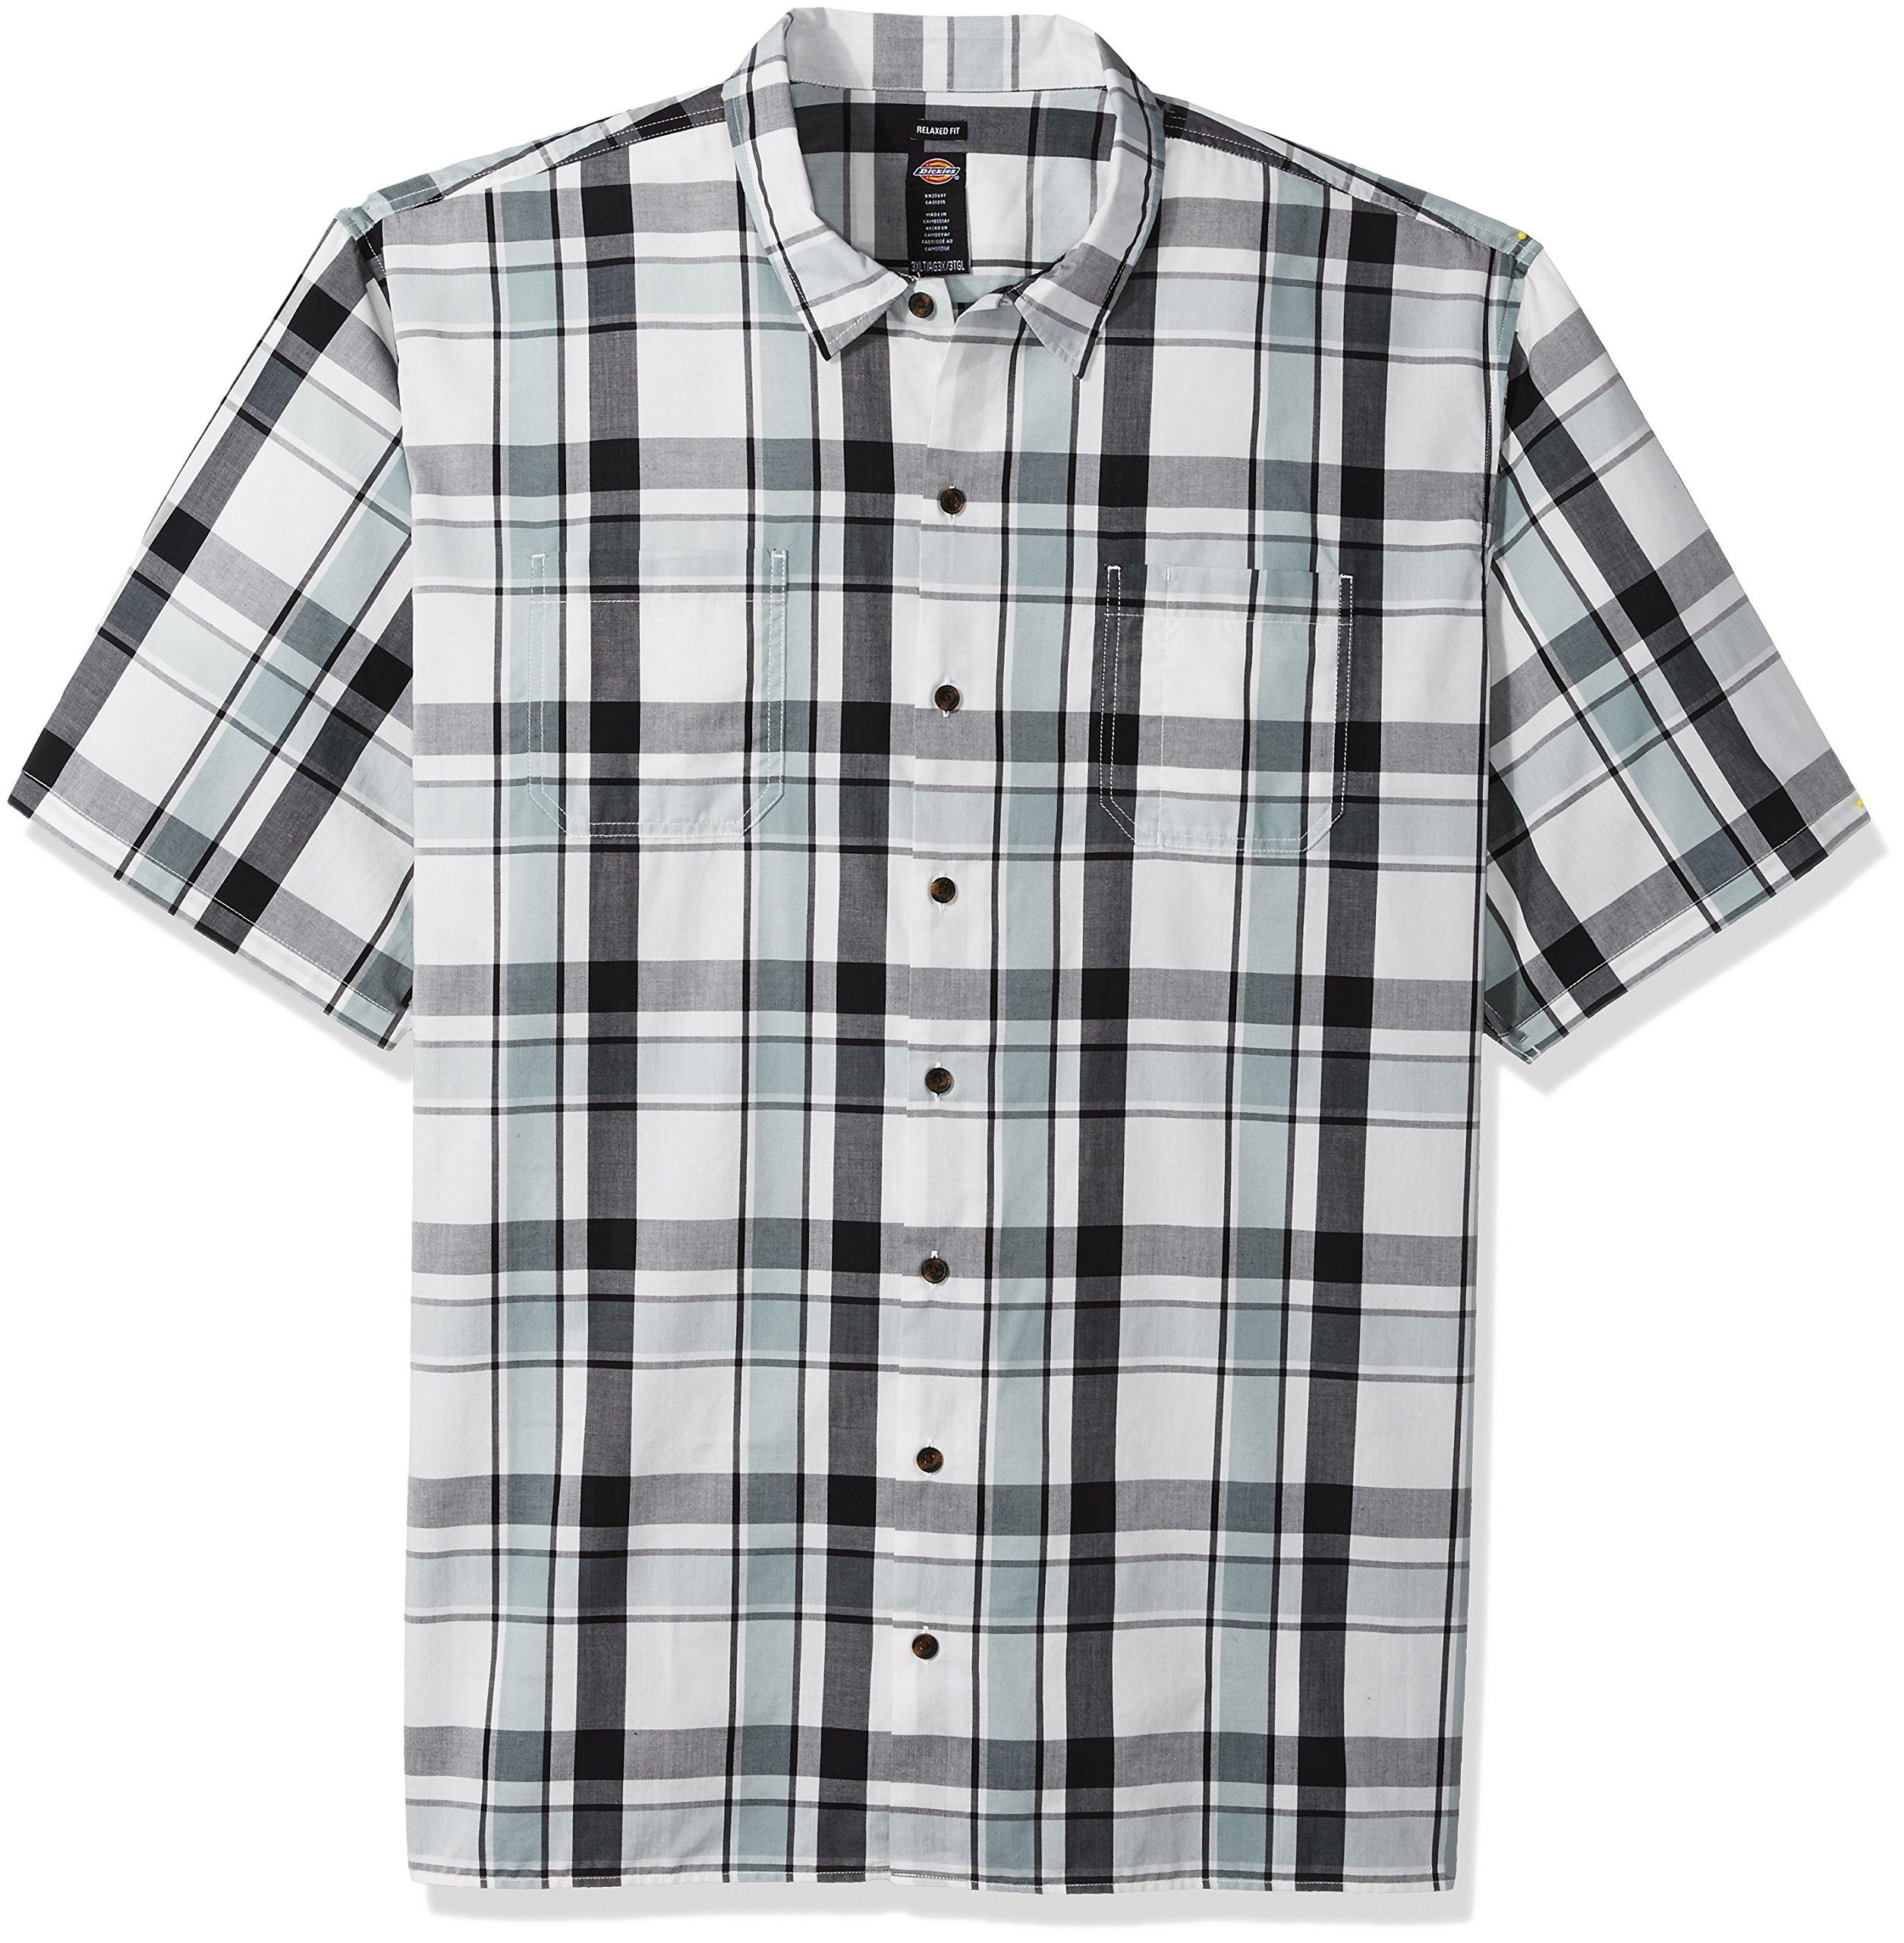 Zantt Mens Casual Floral Printing Short Sleeve Stylish Dress Shirt Top